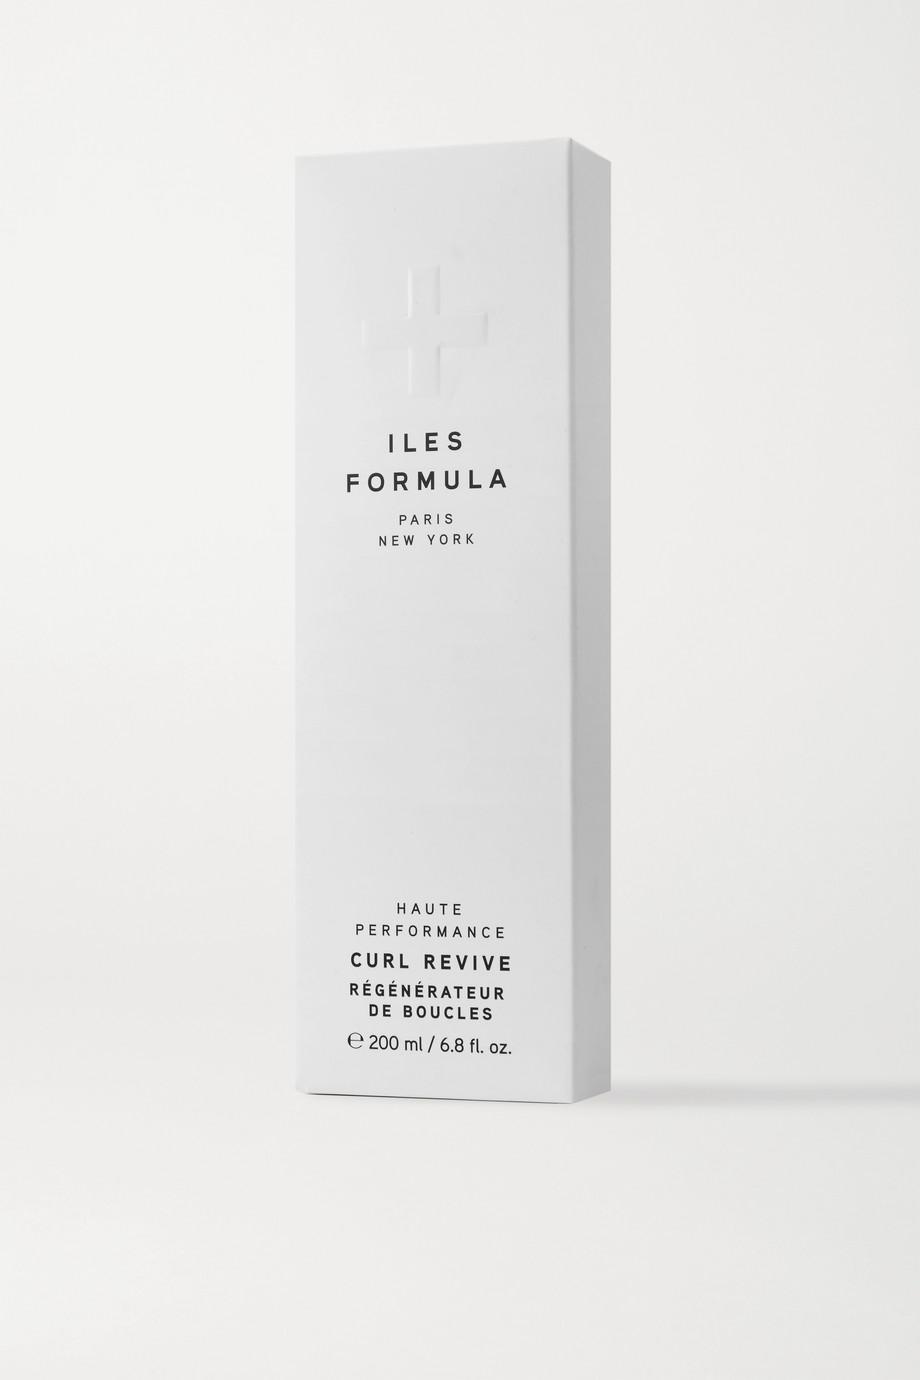 Iles Formula Haute Performance Curl Revive Spray, 200ml